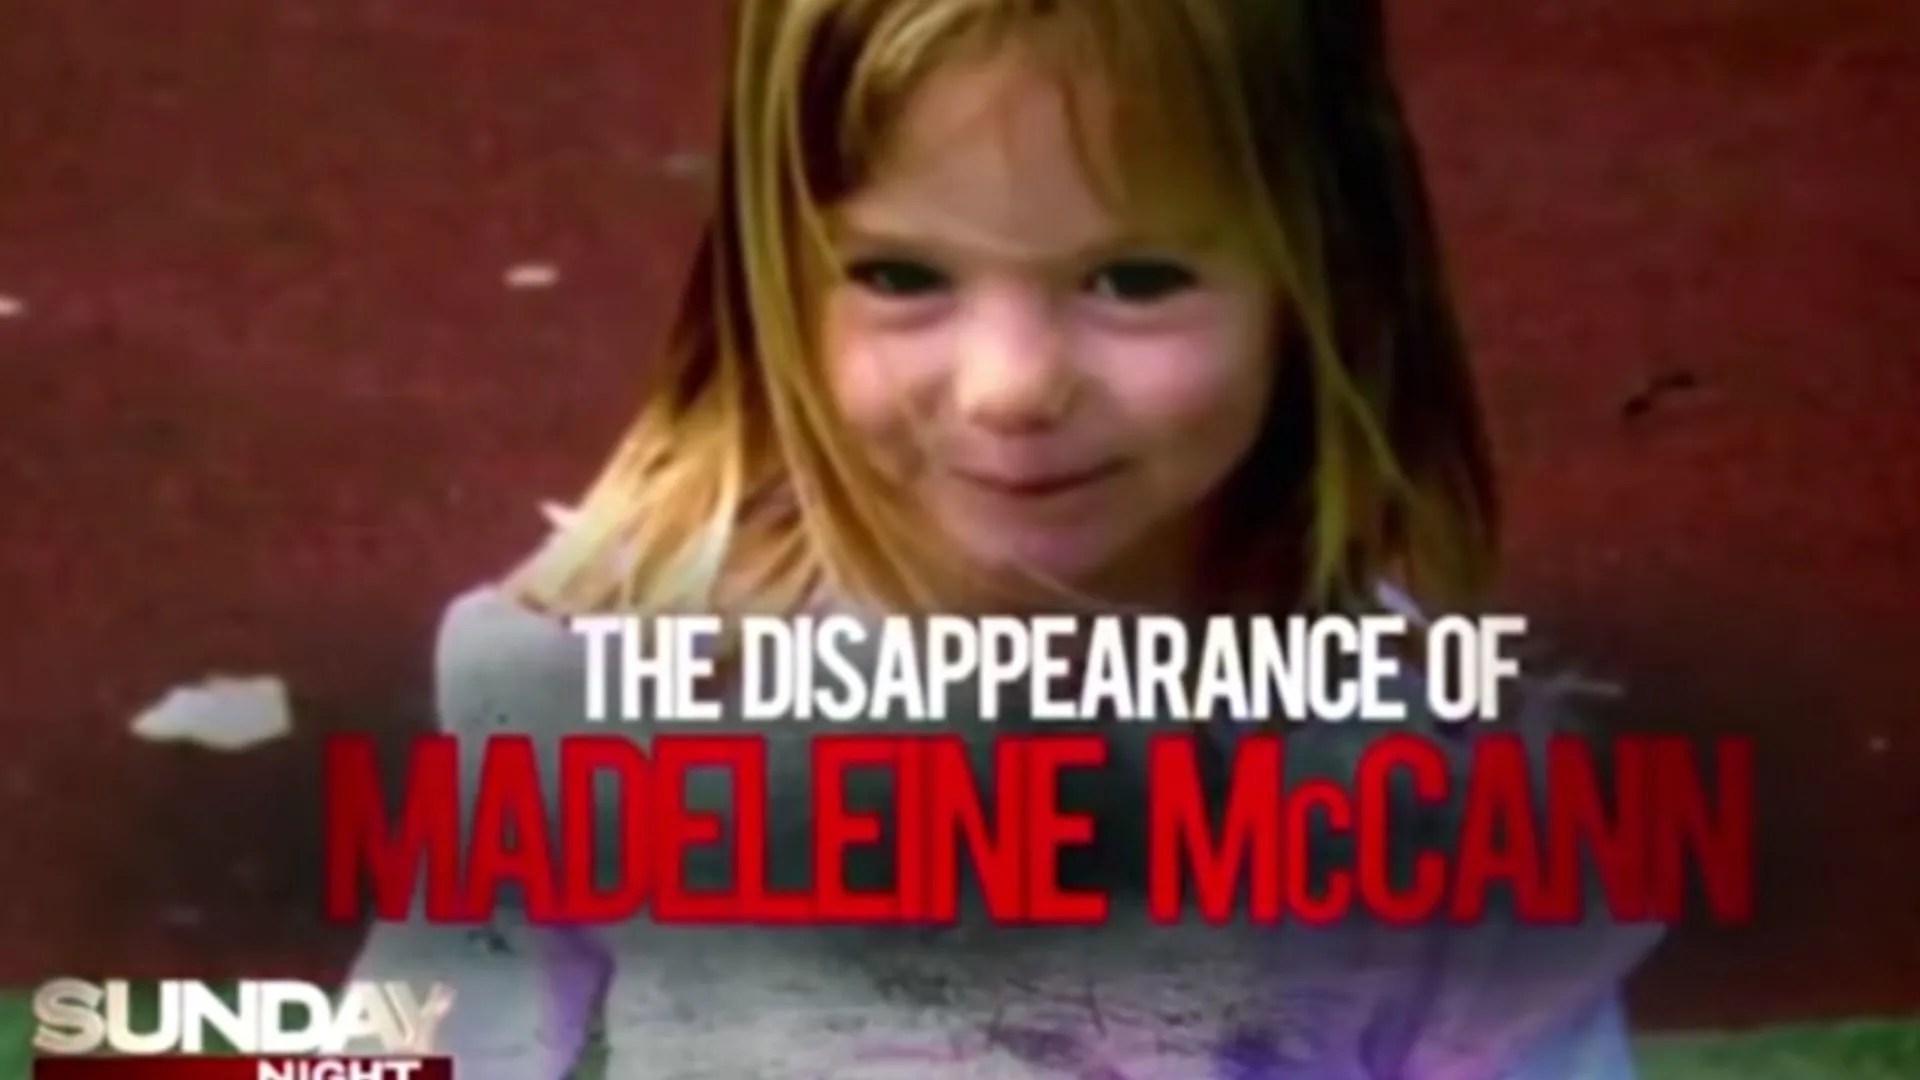 Madeleine McCann Documentary Reveals New Lead In Case